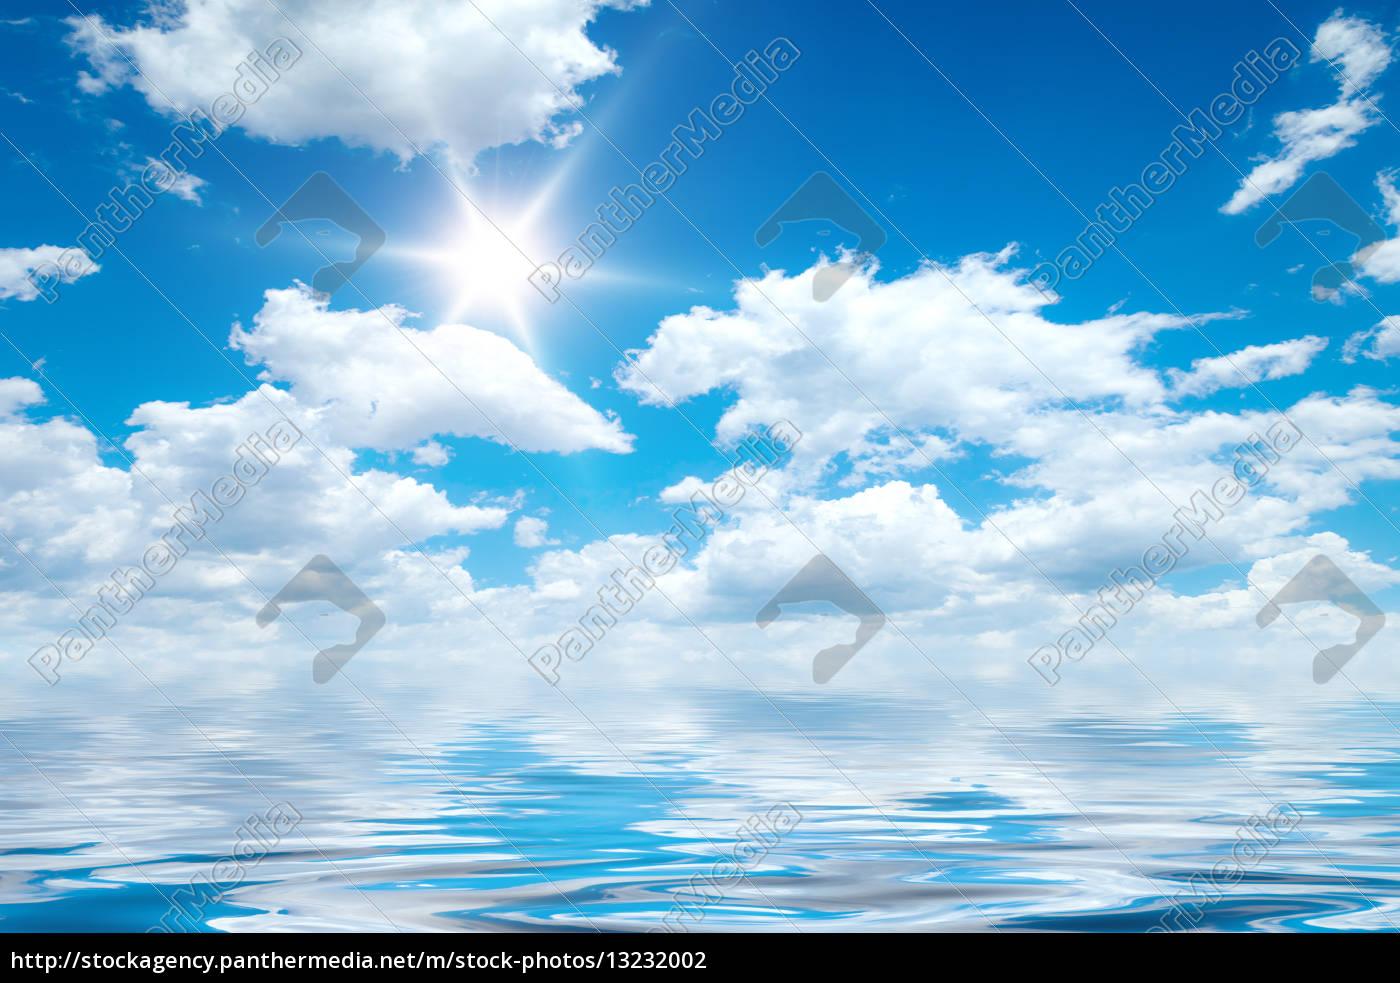 blue, sky - 13232002